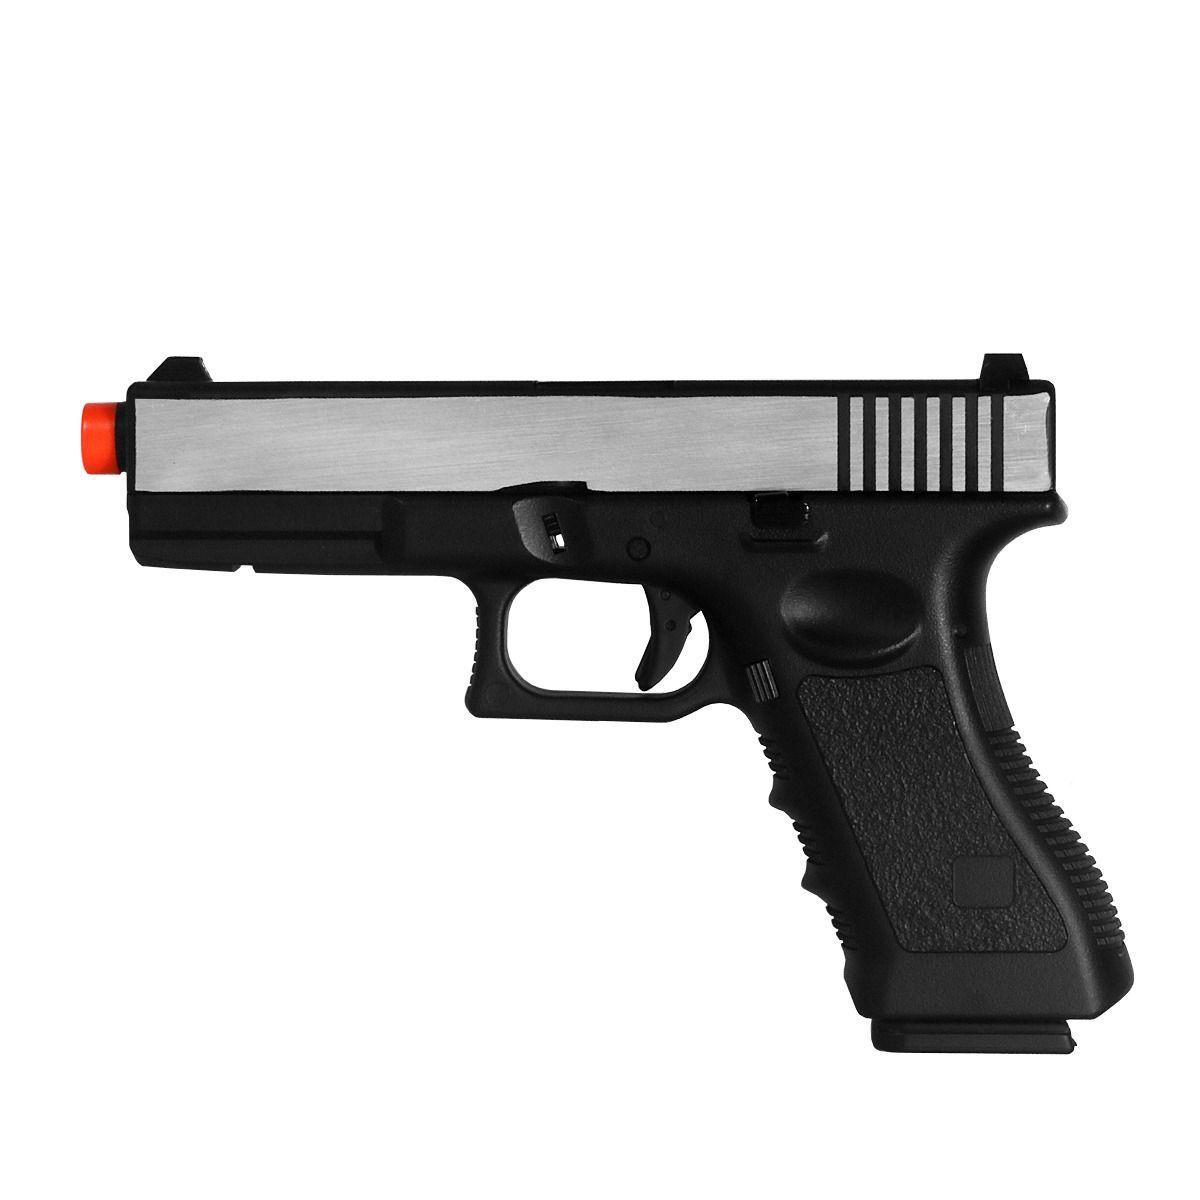 Pistola Airsoft - Glock Double Bell G17 721L Preta Cromada- GBB